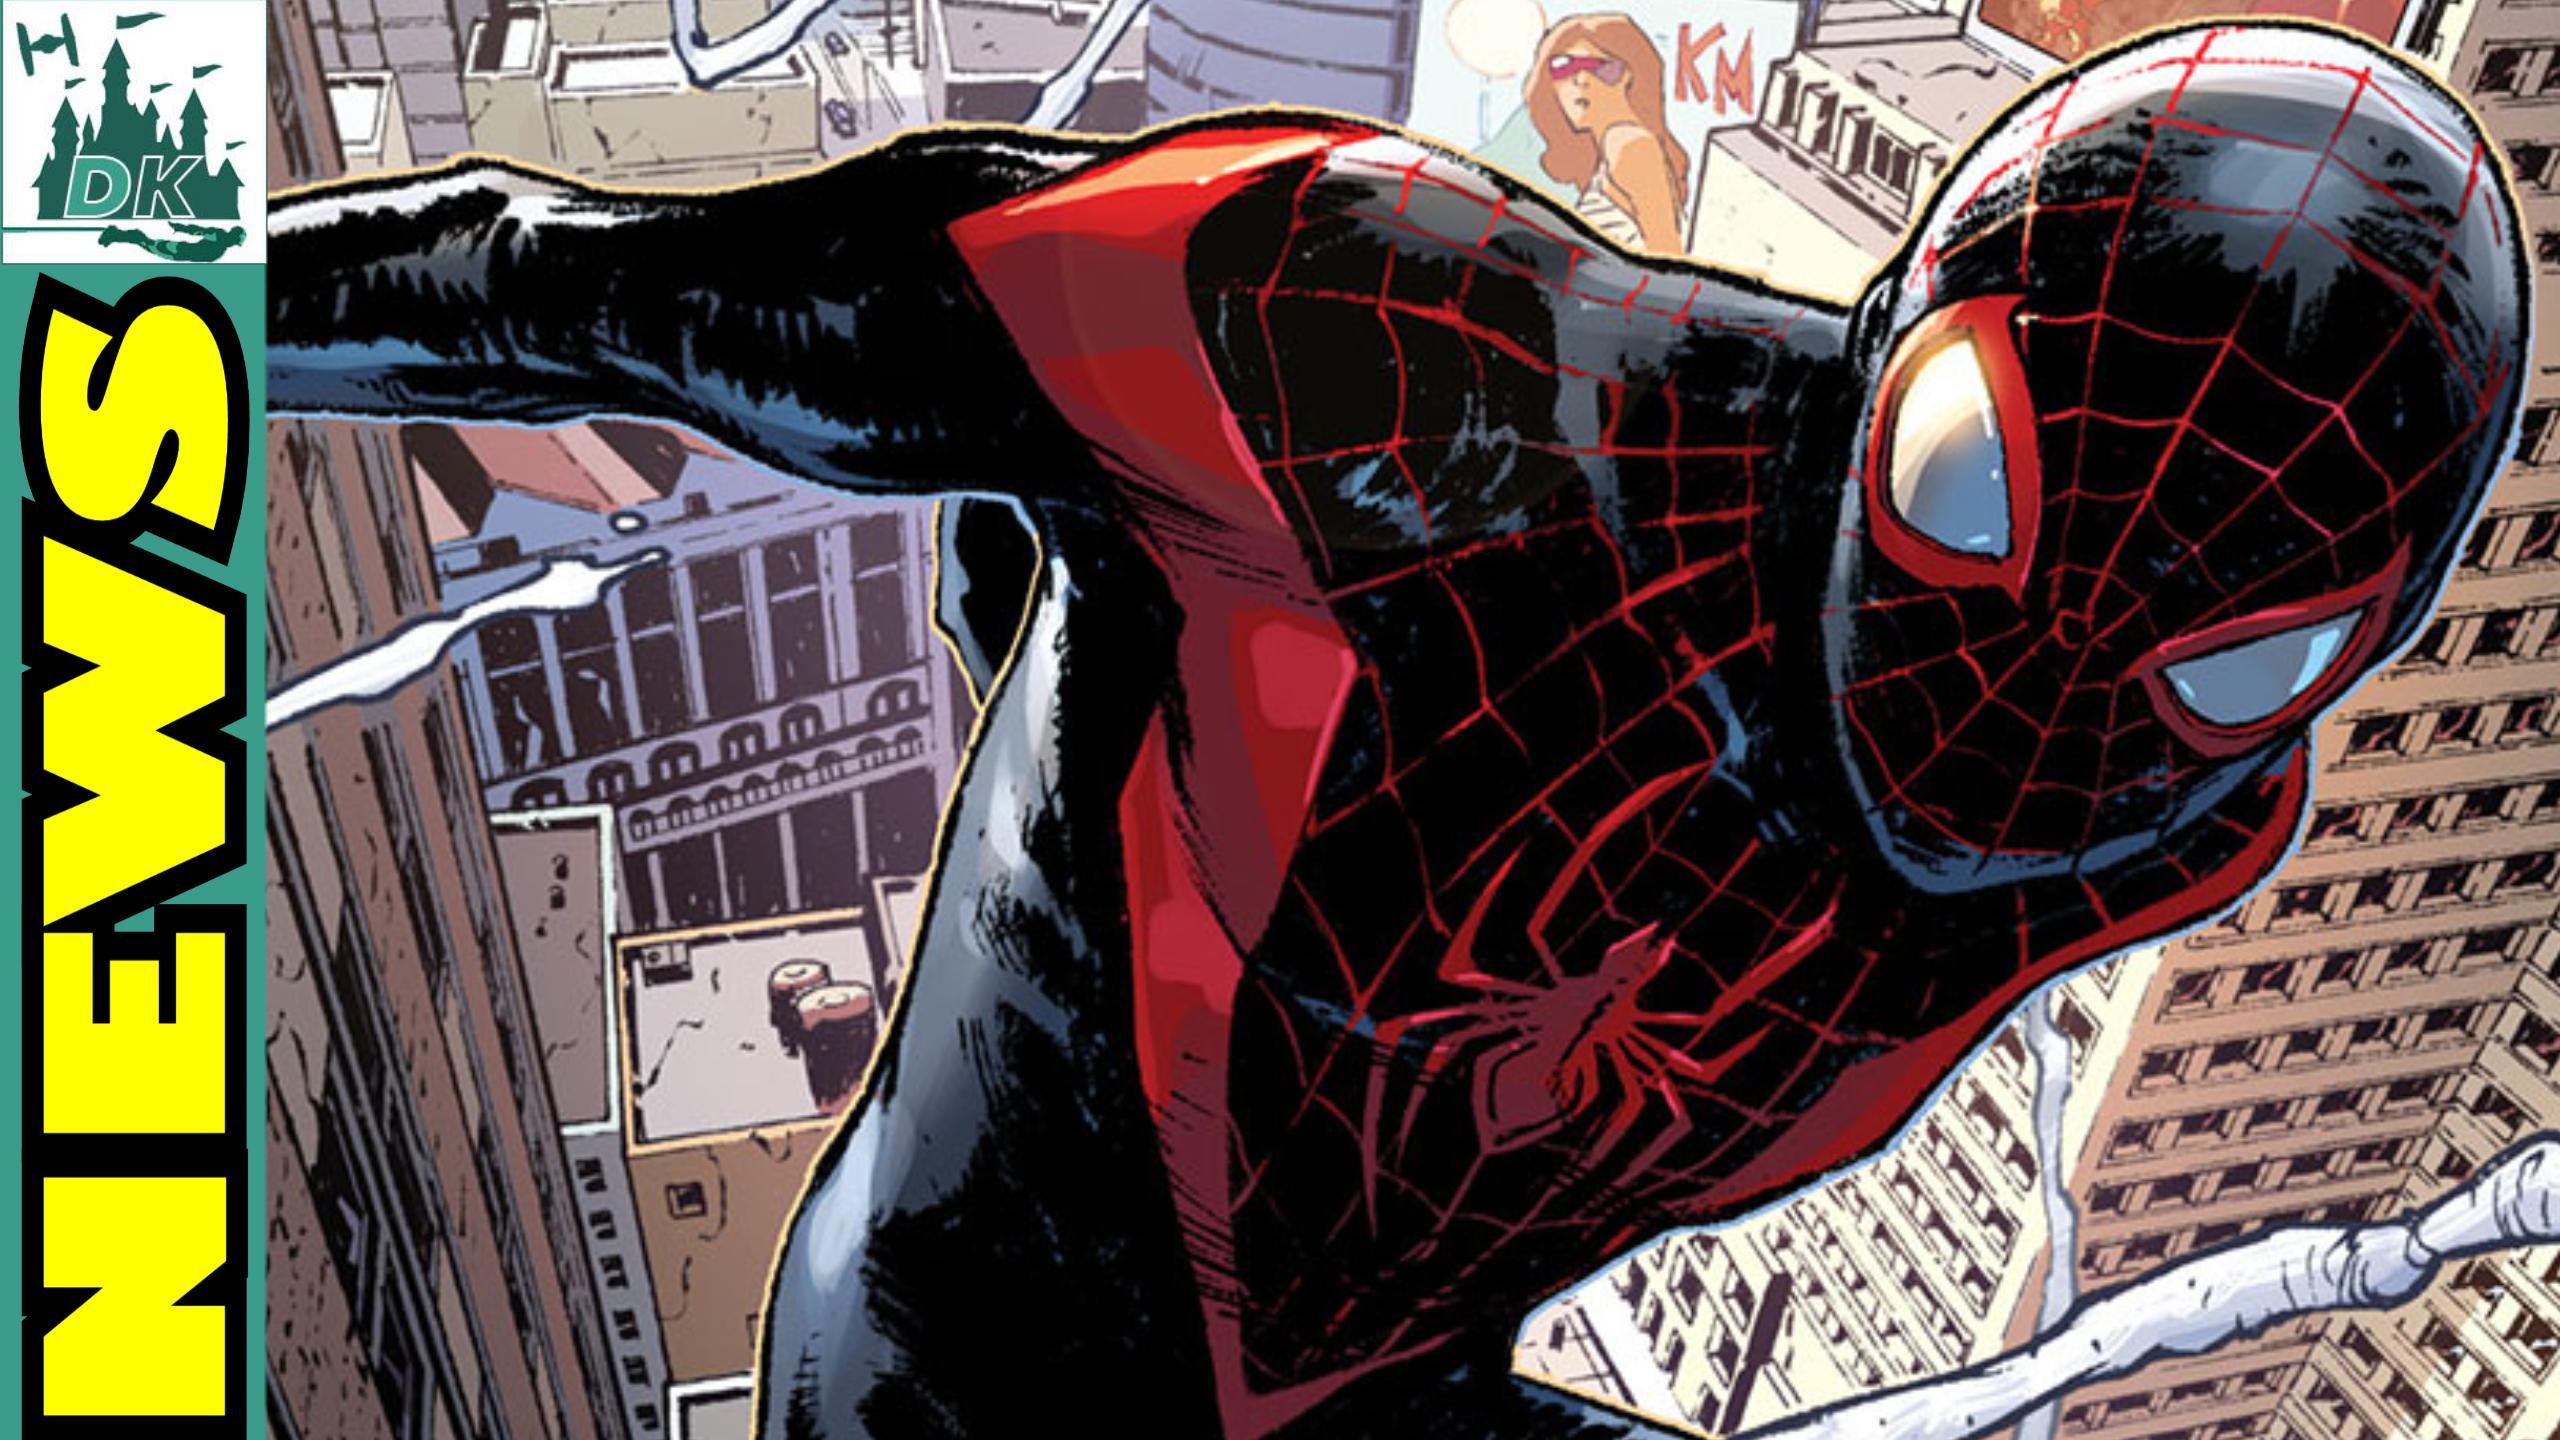 Animated Spider-Man Movie To Focus On Miles Morales   DK Disney News